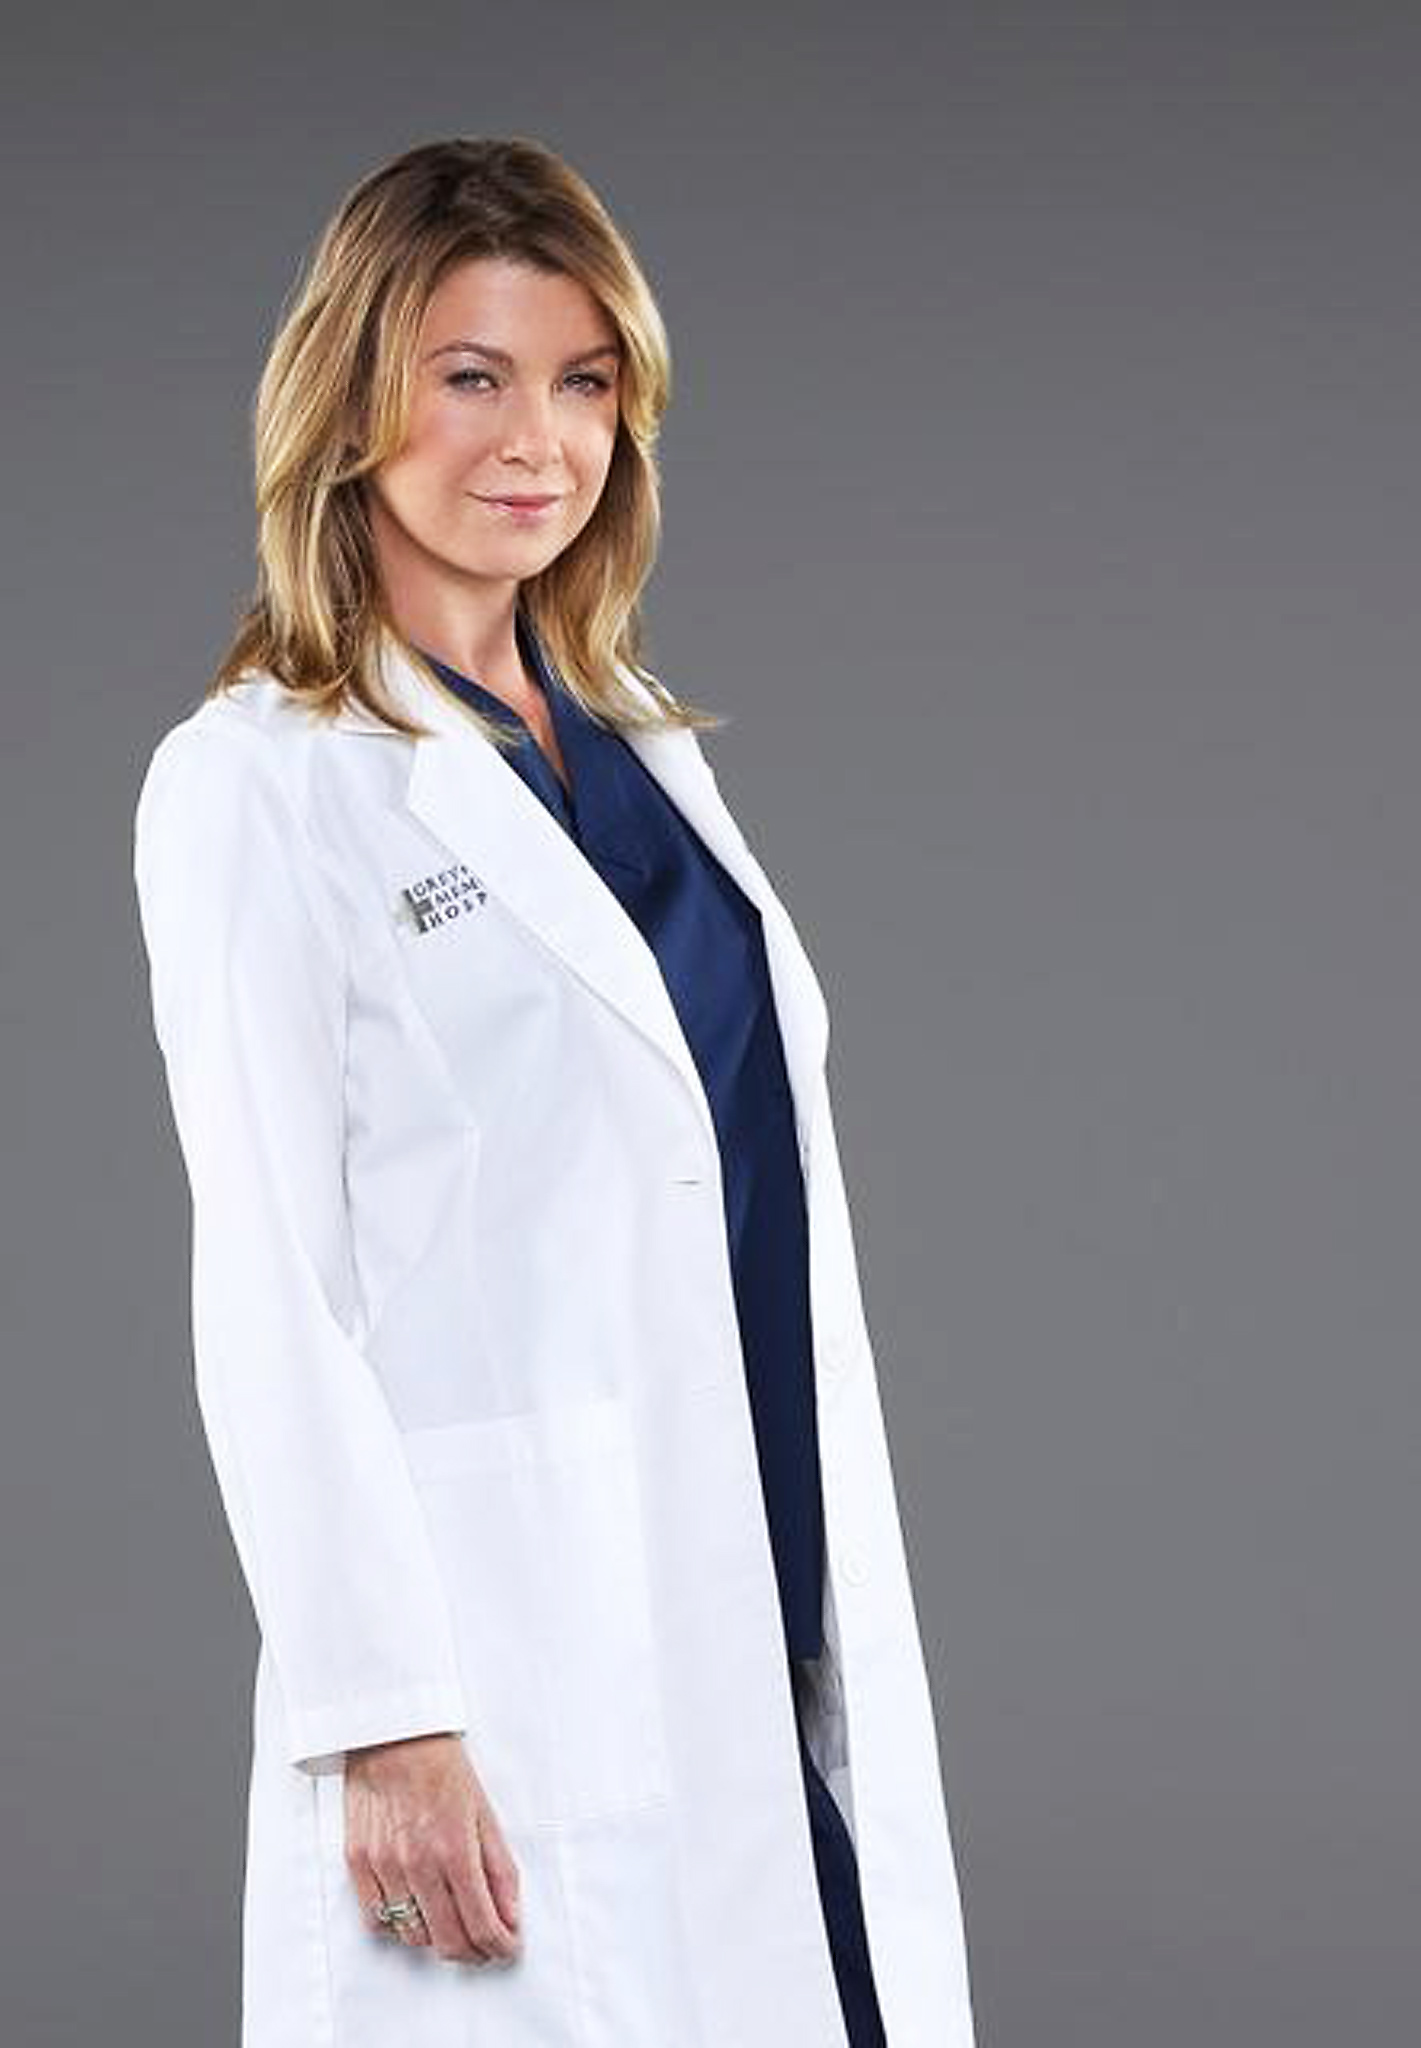 Greys-Anatomy-Audition-ellen-pompeo1.jpg